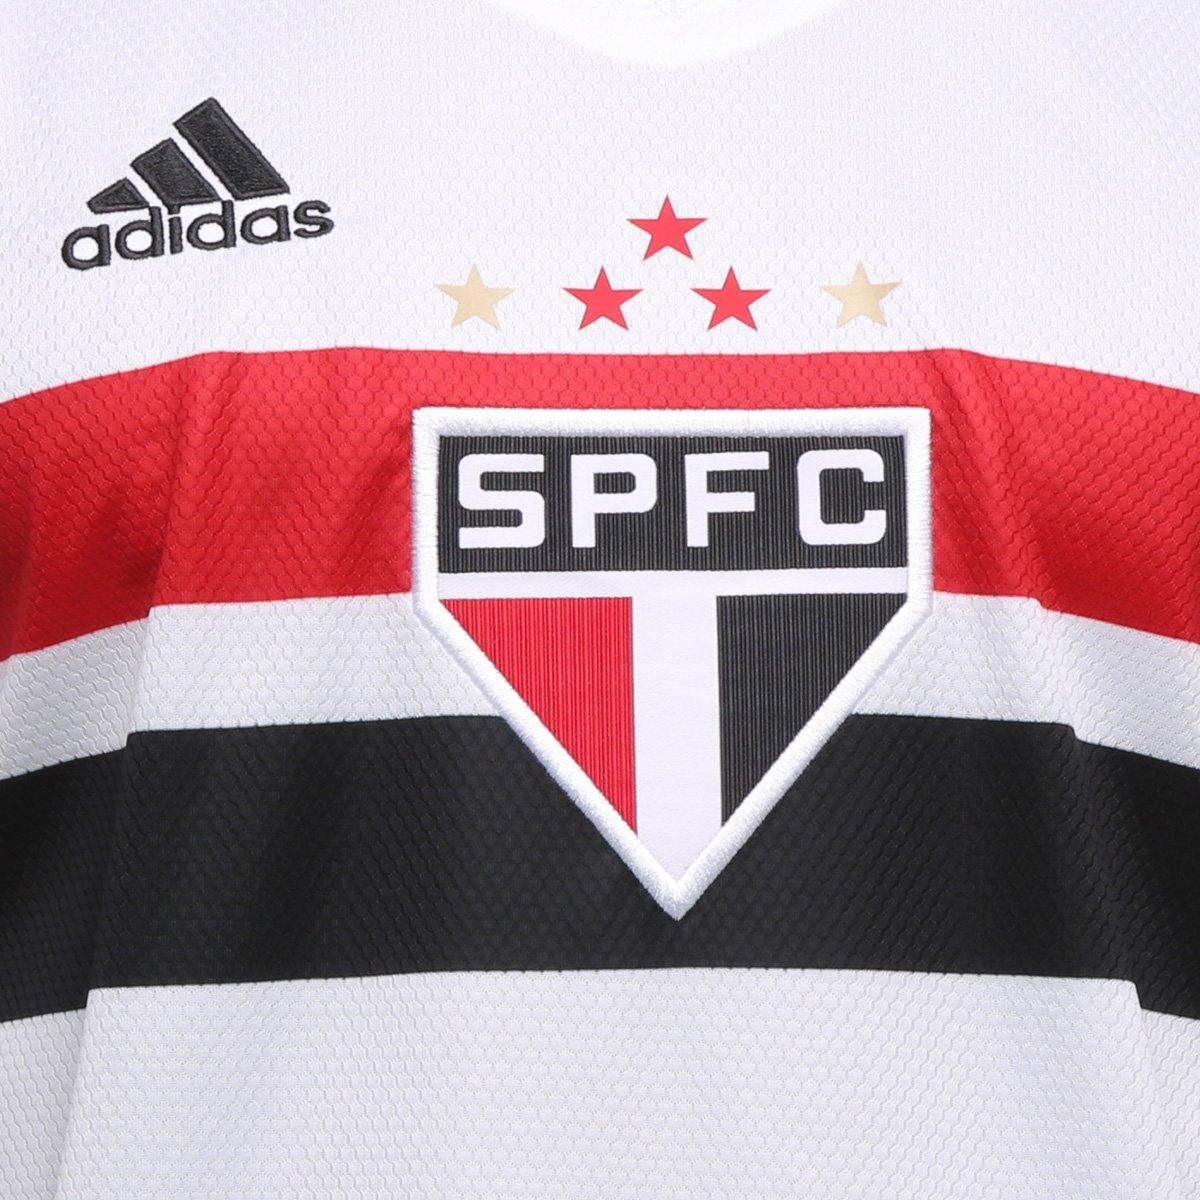 CAMISA CLUBE ADIDAS SAO PAULO I GK9828 BRANCO MASCULINO